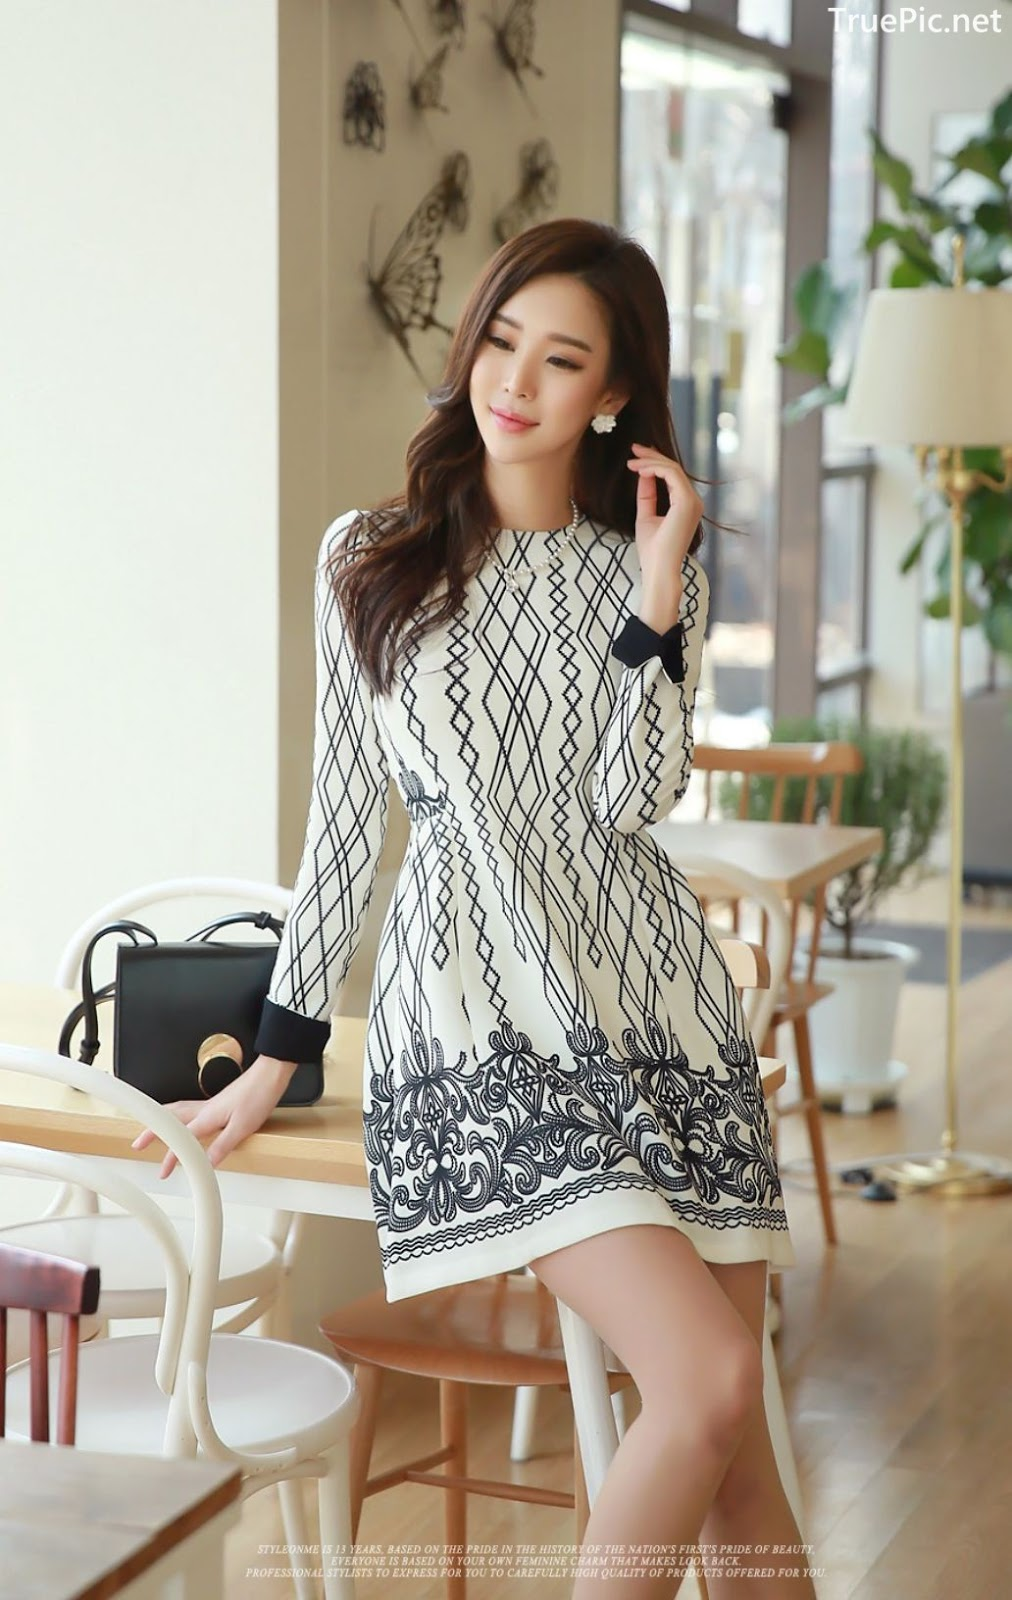 Image-Korean-Fashion-Model-Park-Da-Hyun-Office-Dress-Collection-TruePic.net- Picture-7